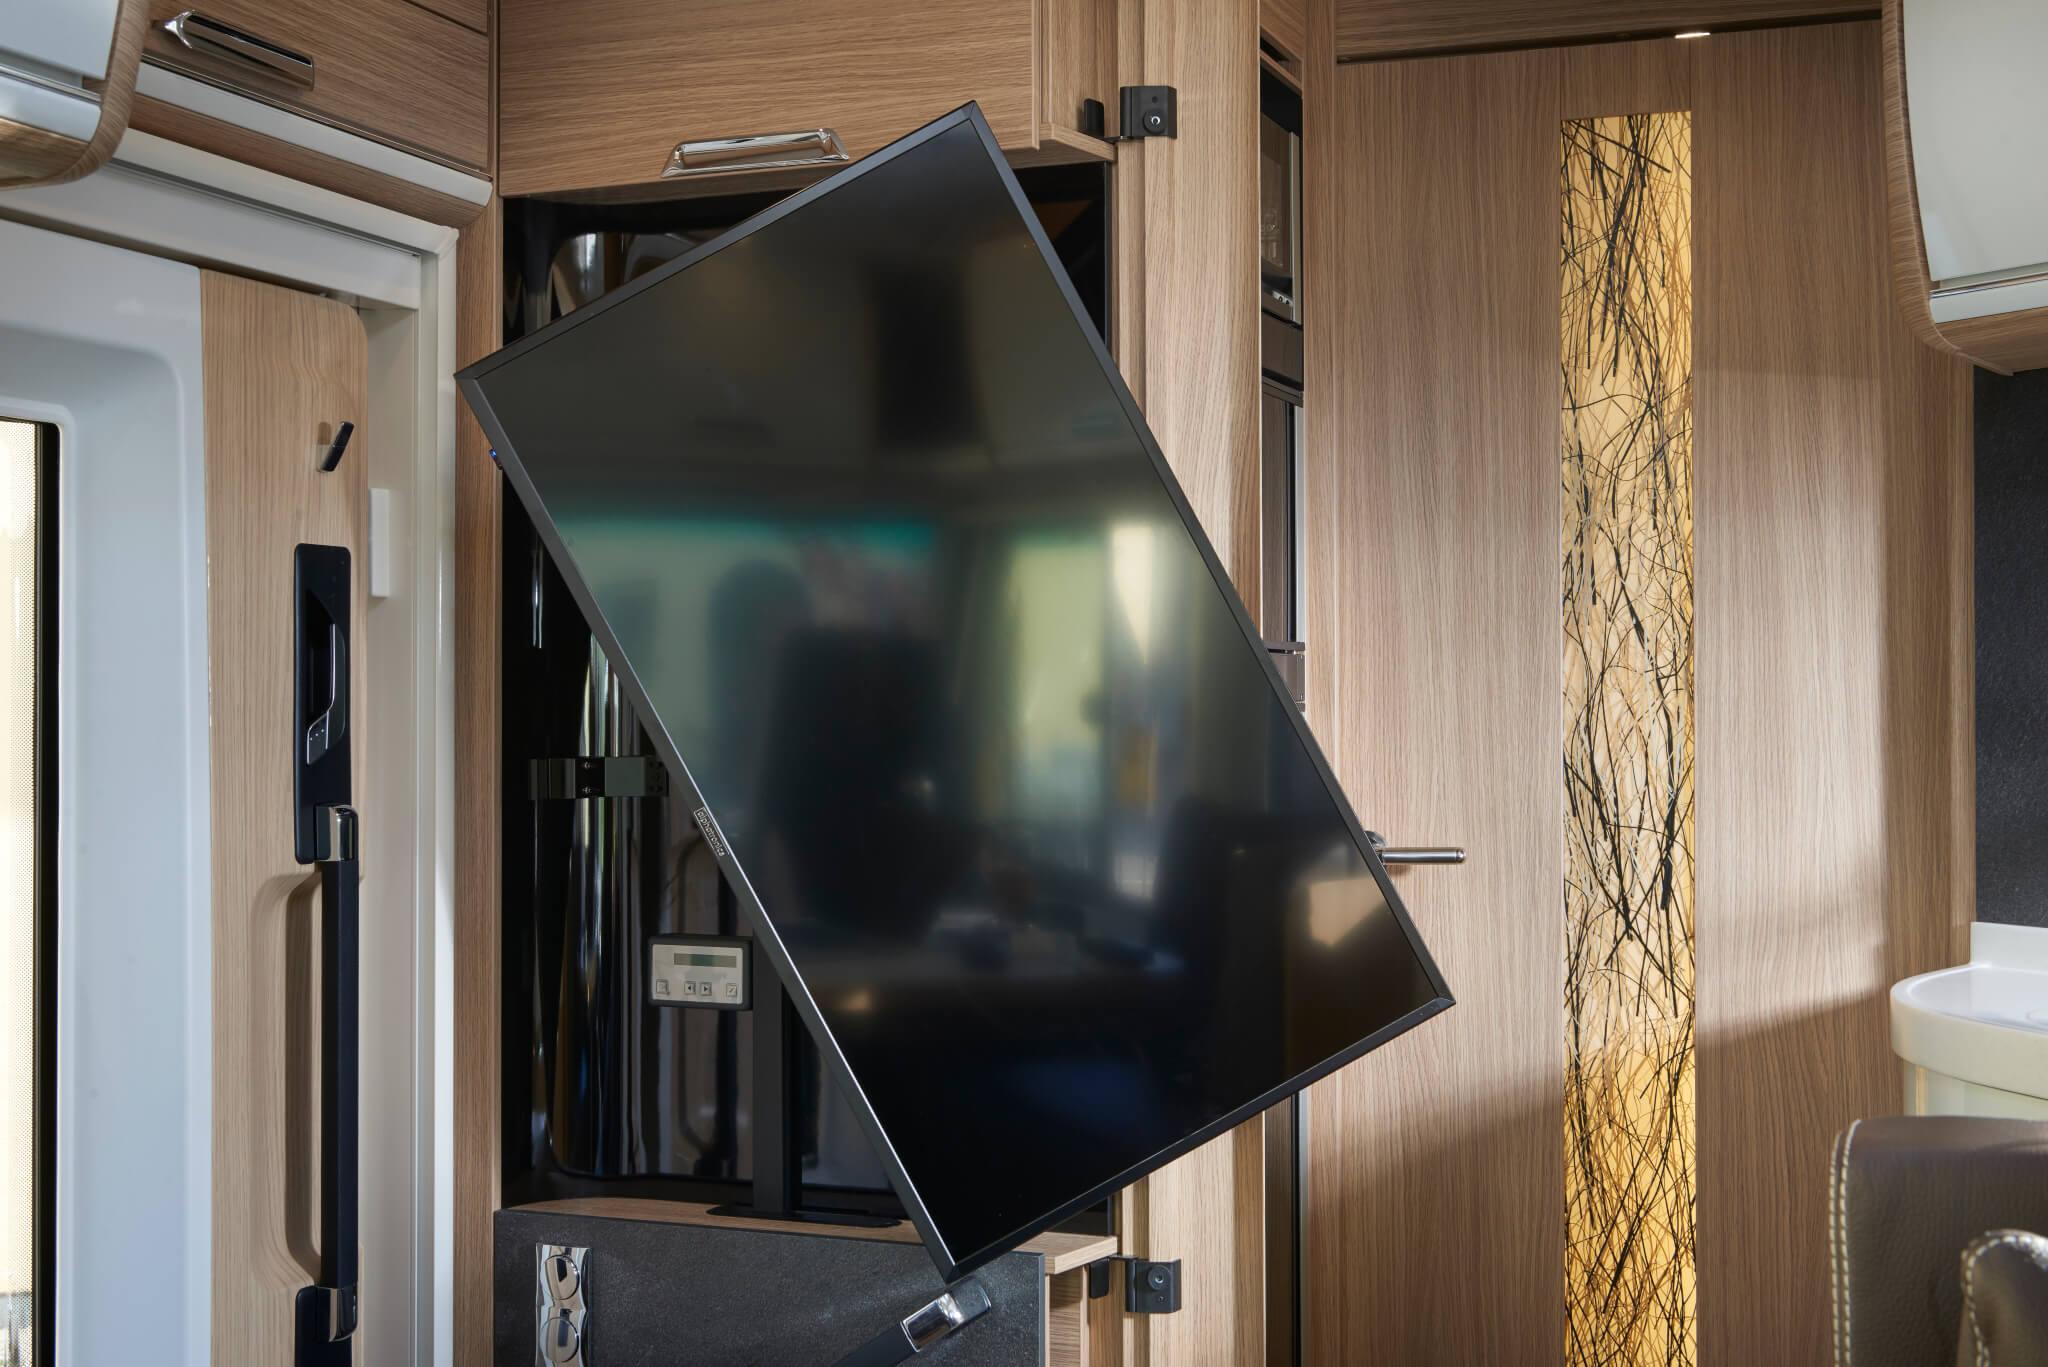 NIESMANN+BISCHOFF - Flair - Flair 920 LW - television 42 inch LED-TV